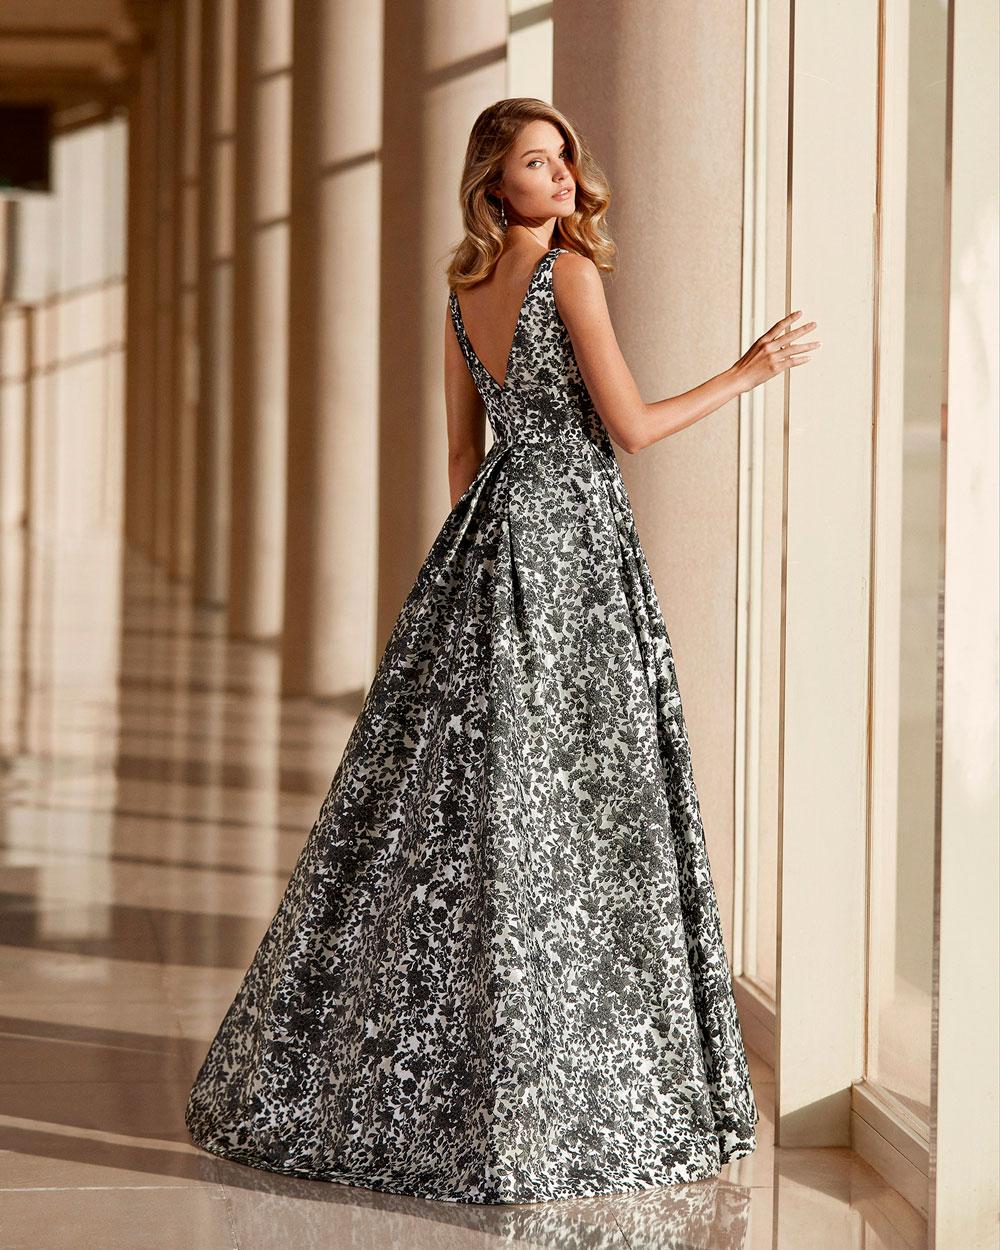 vestido de fiesta 2020 4T1D2 ROSA CLARA COCKTAIL 2